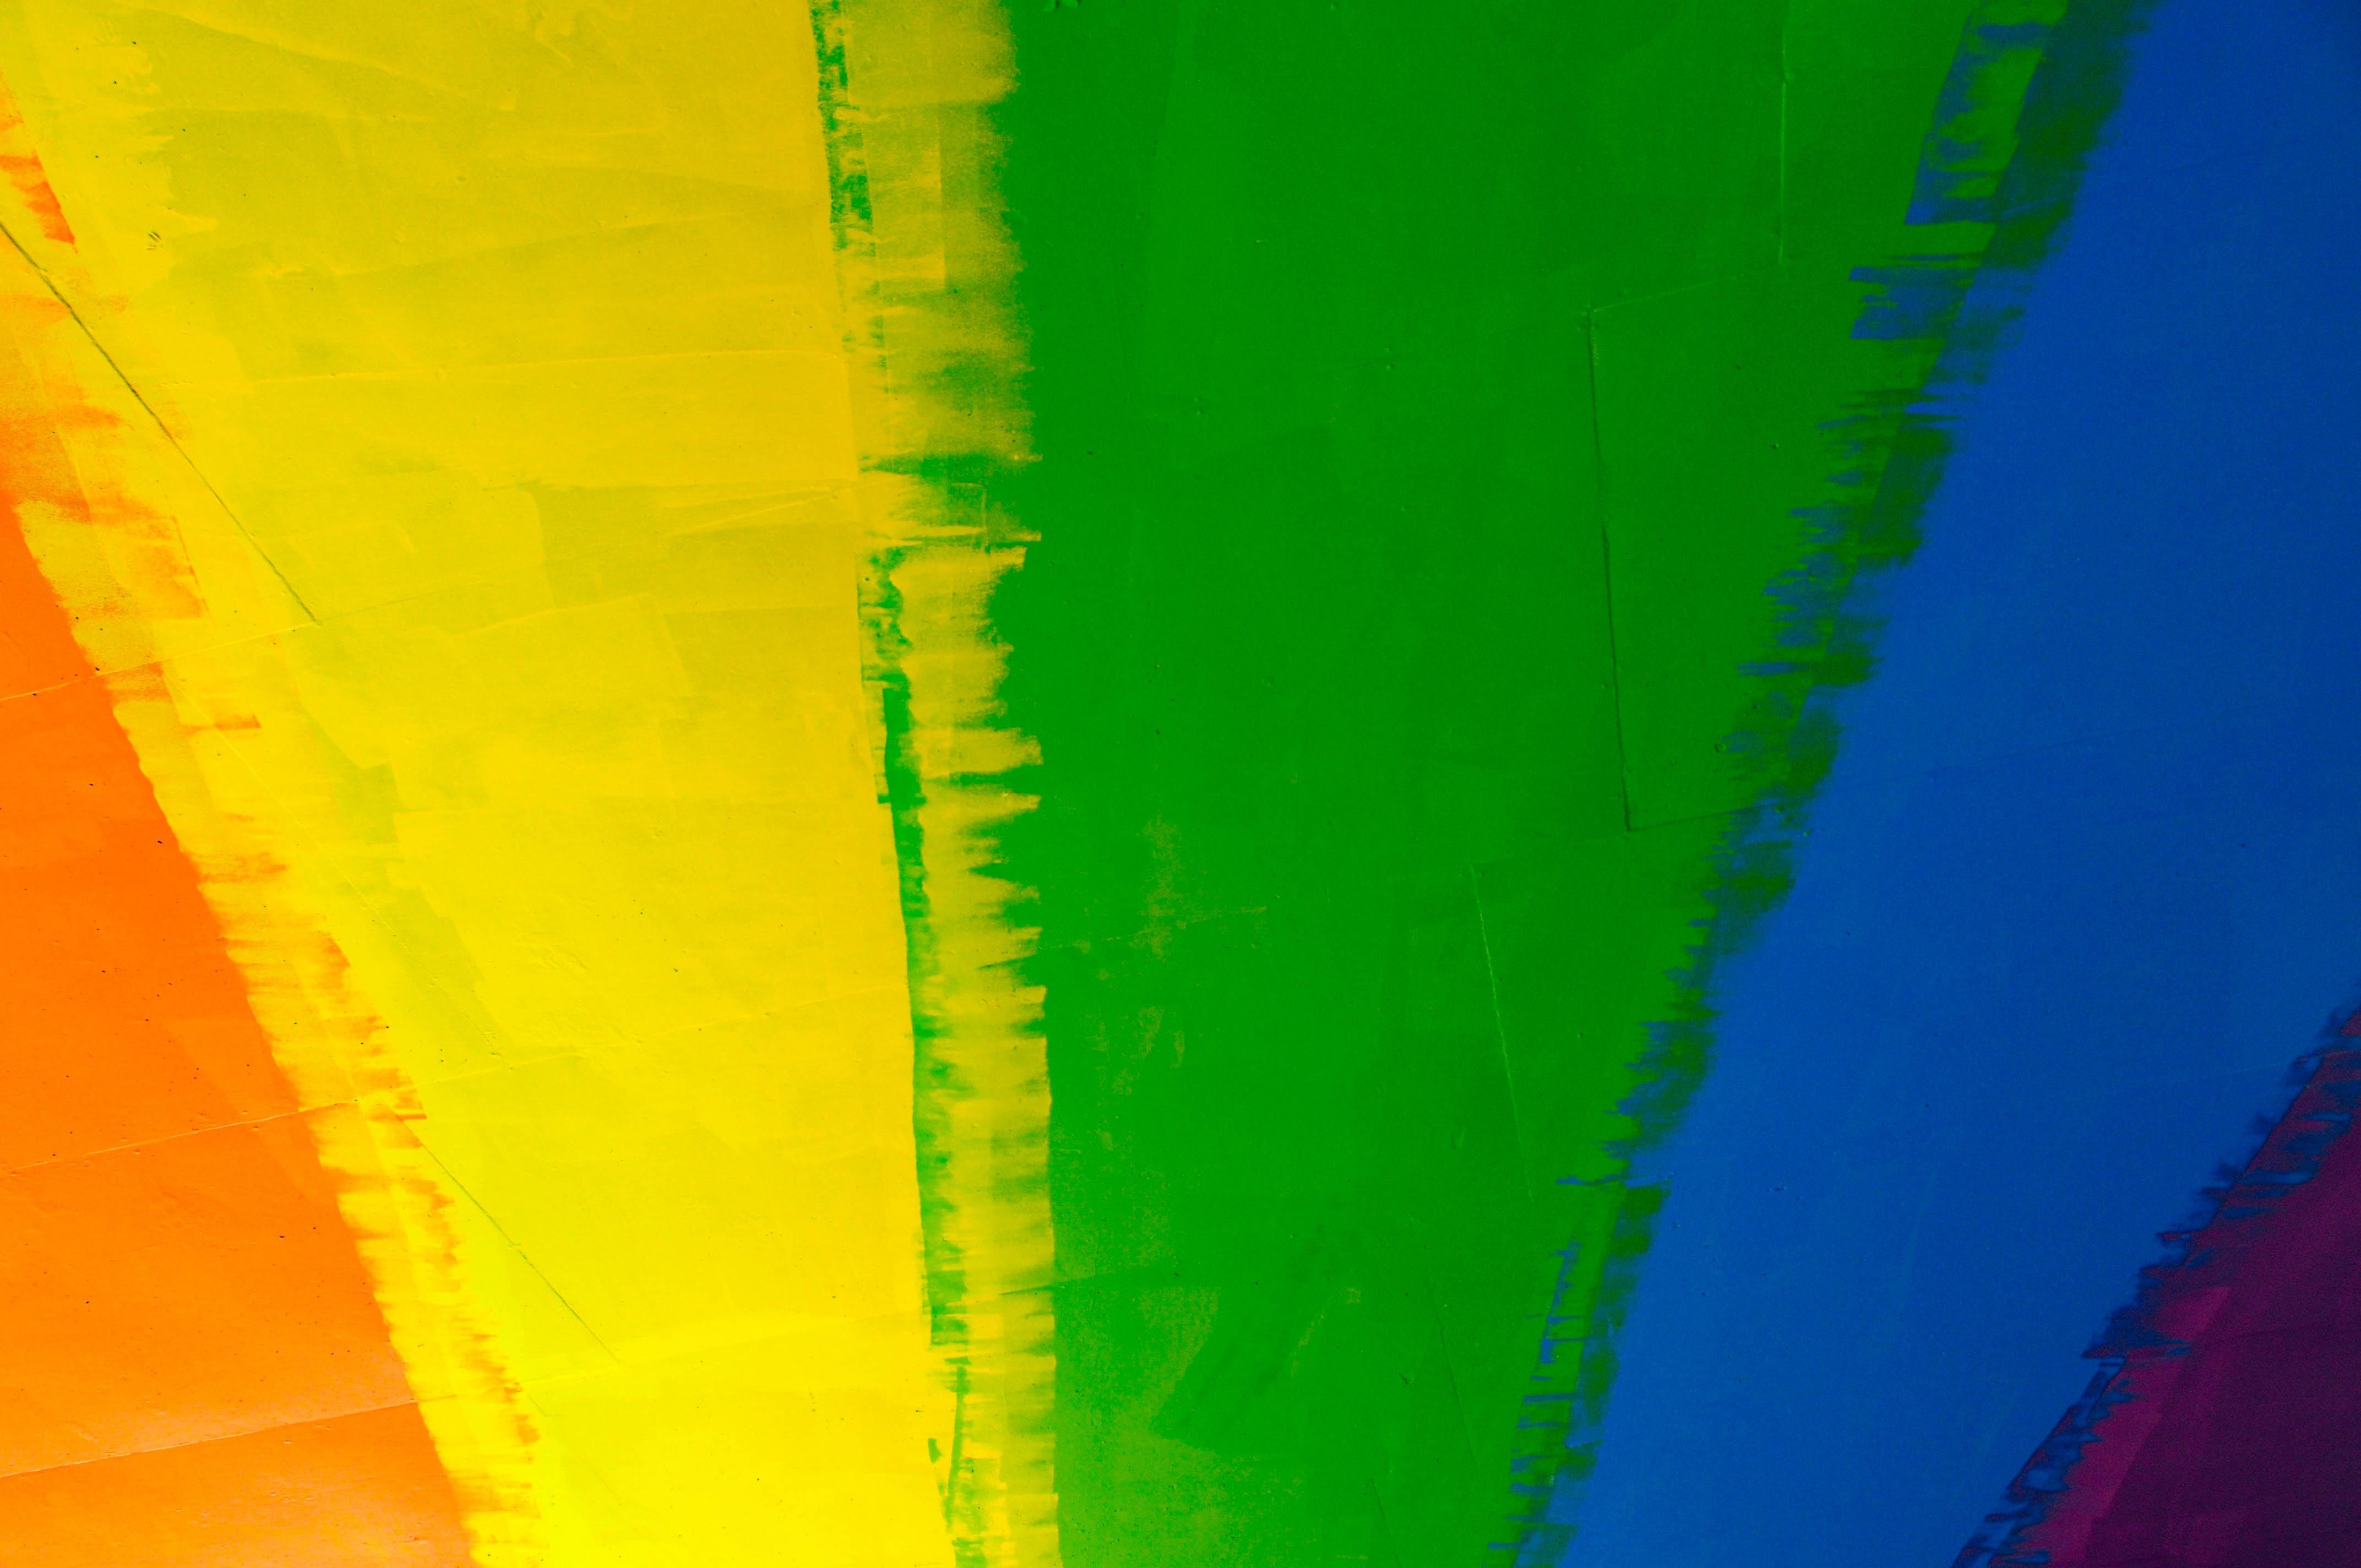 Rainbow painted under a bridge in Calgary Alberta Canada.